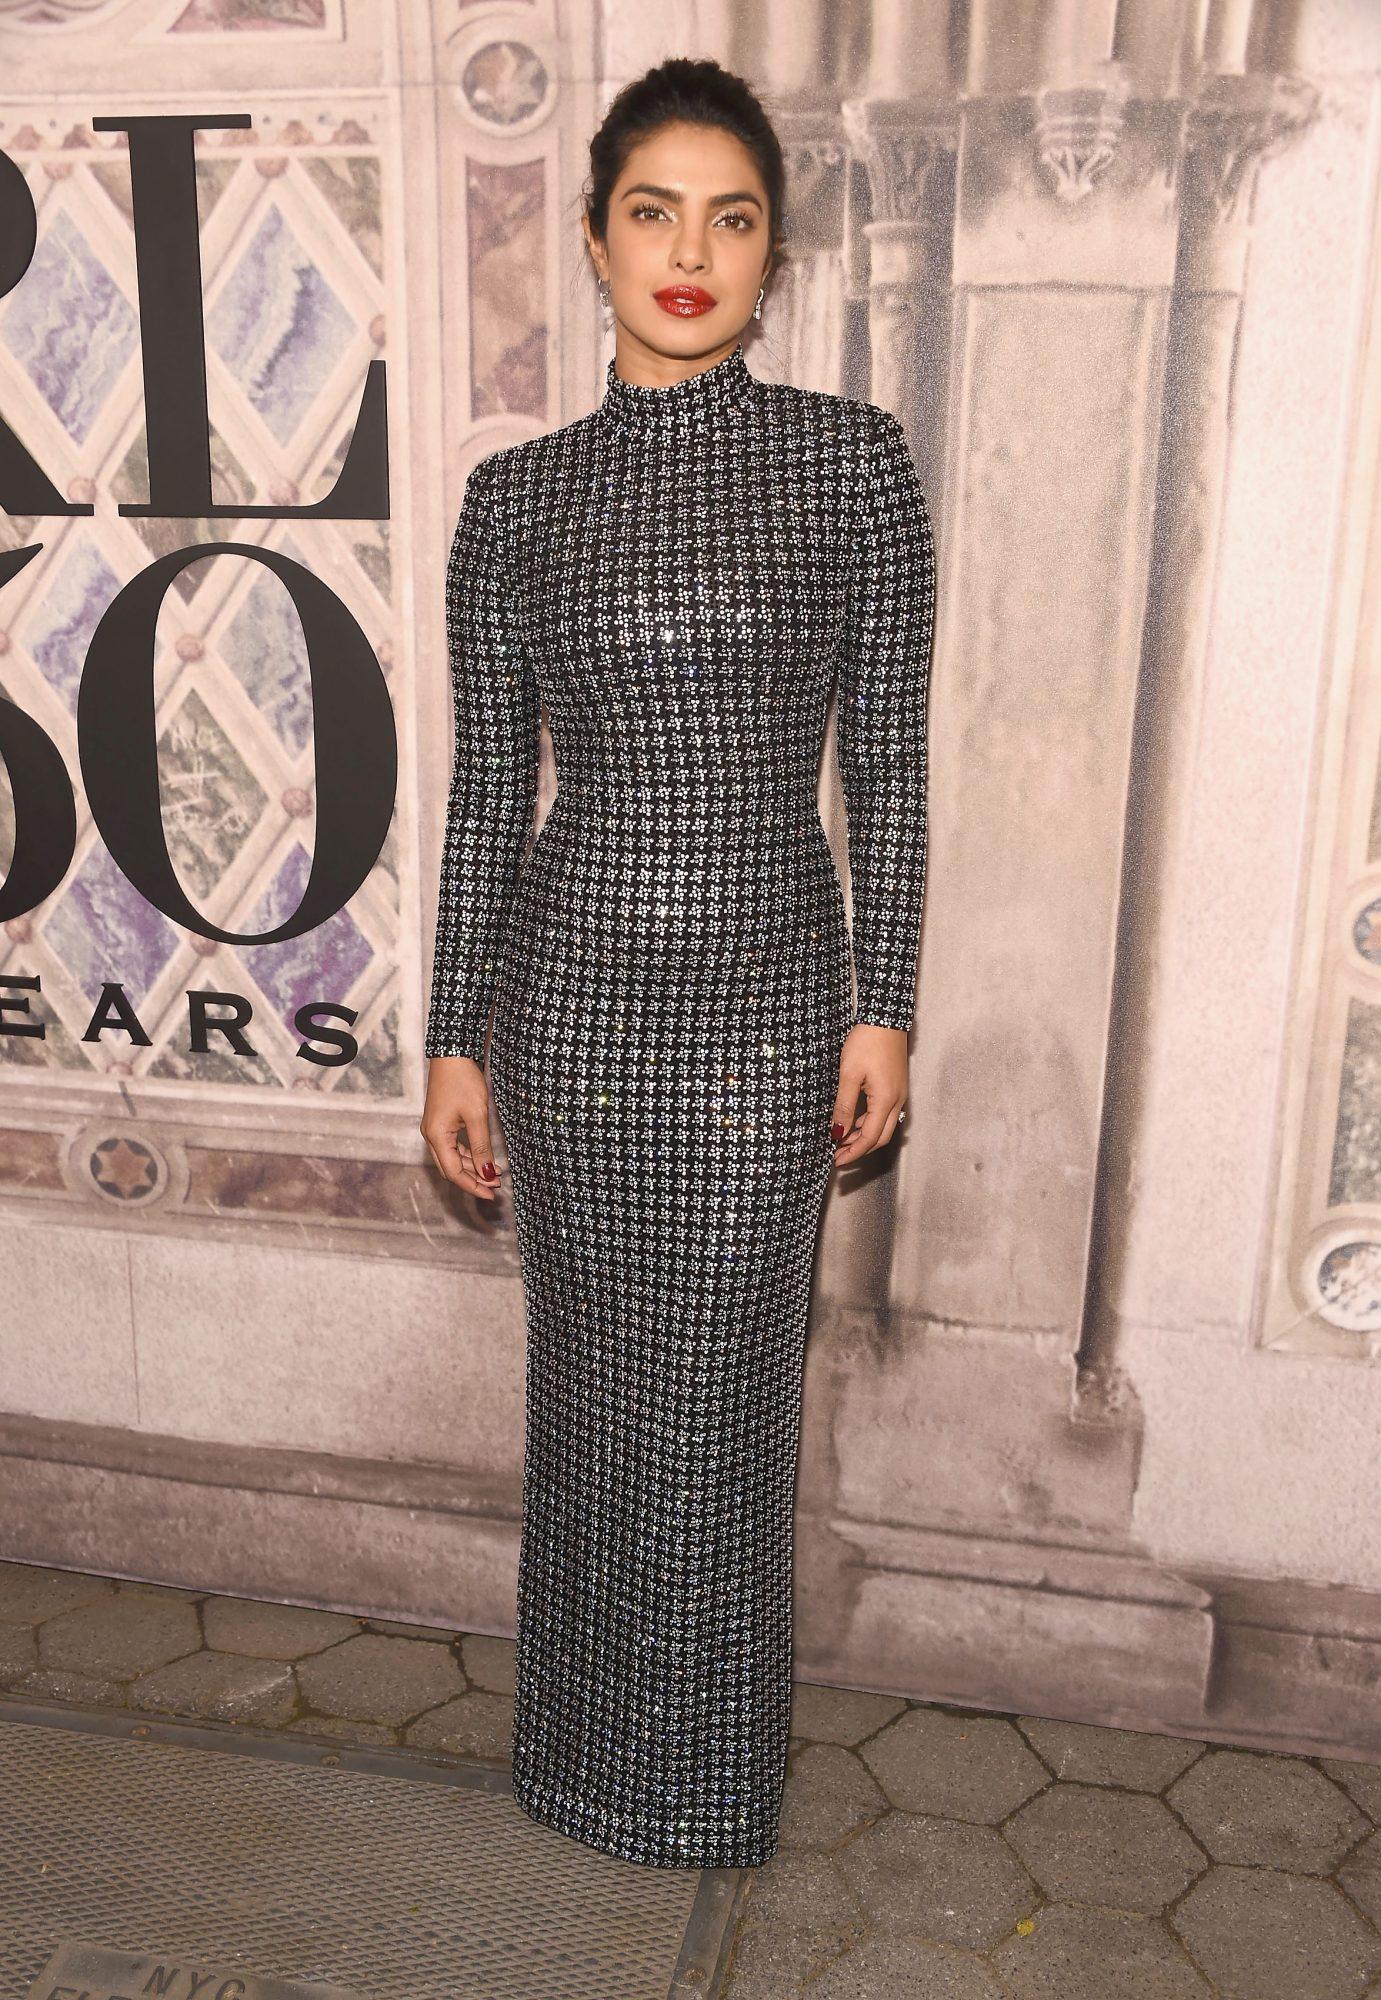 Priyanka Chopra best fashion looks ever Ralph Lauren dress